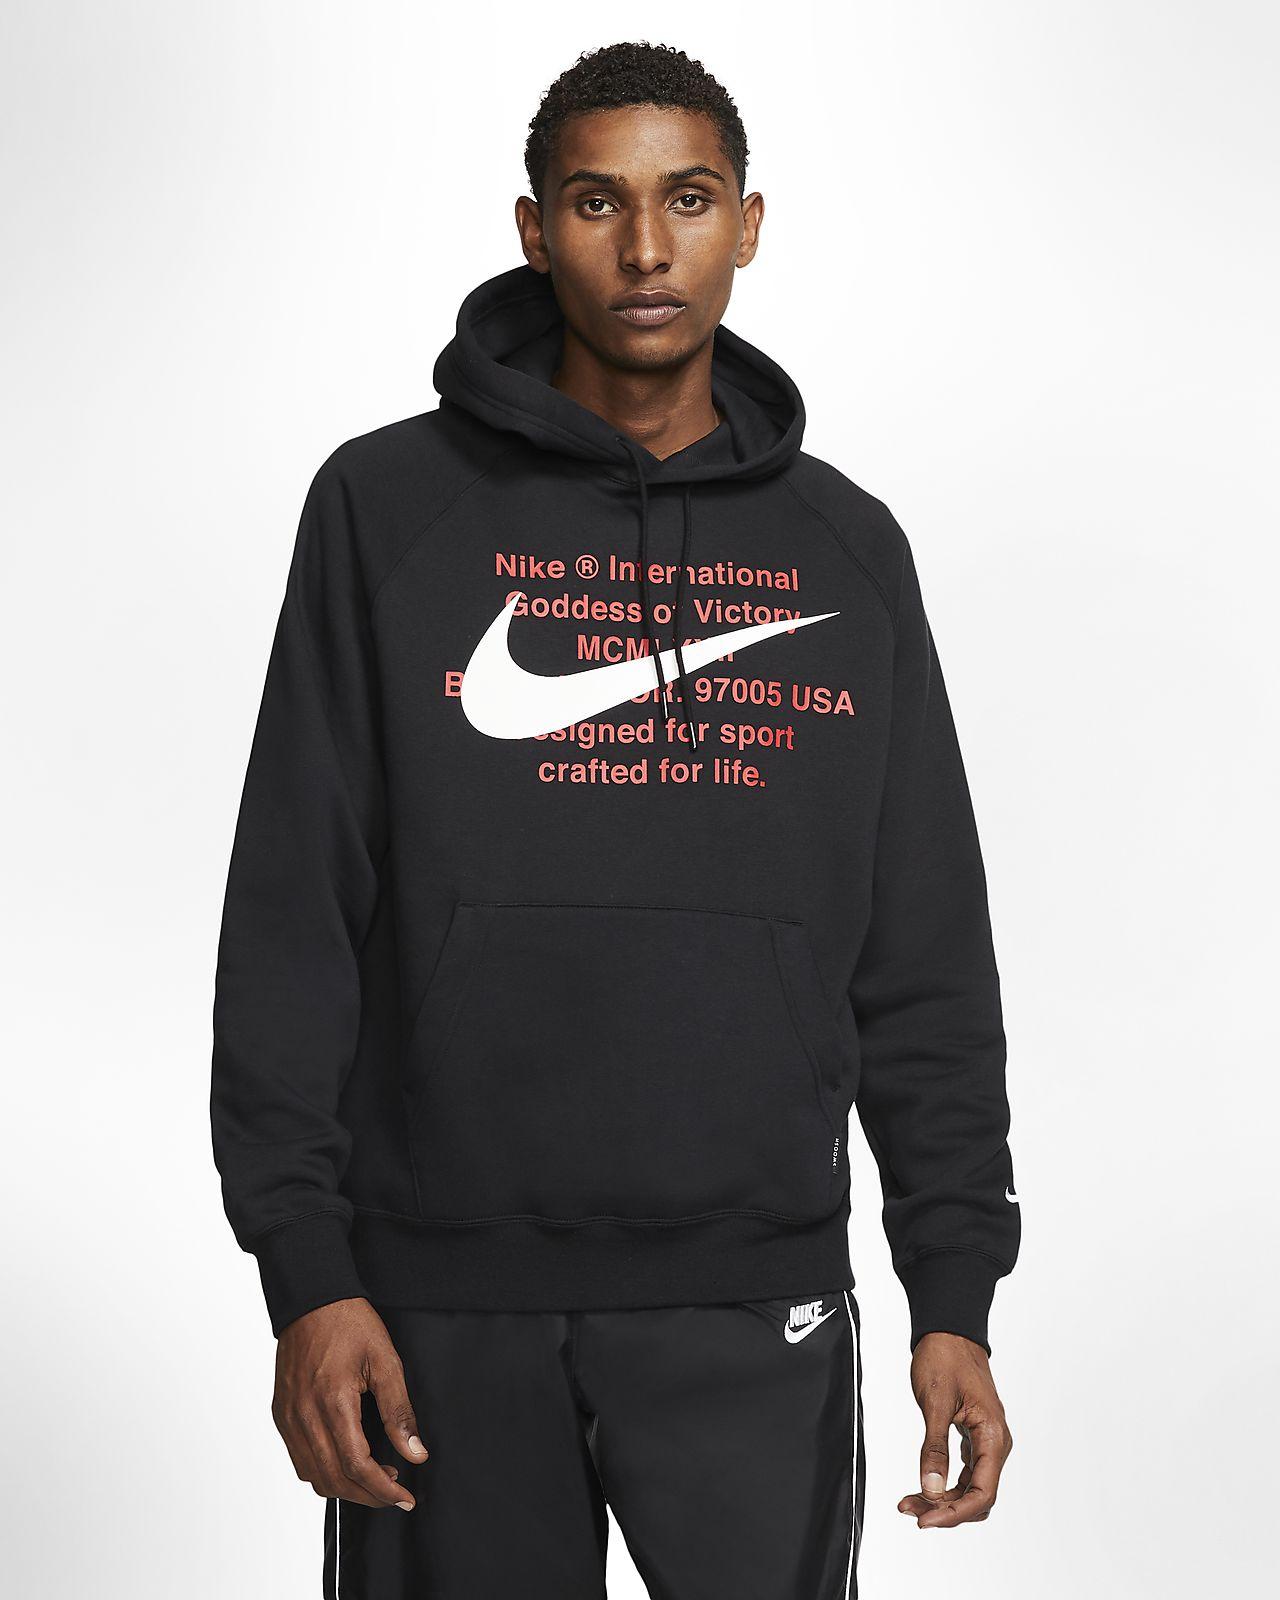 Nike Air Overhead Hoodie Mens   £63.00   Cabot Circus